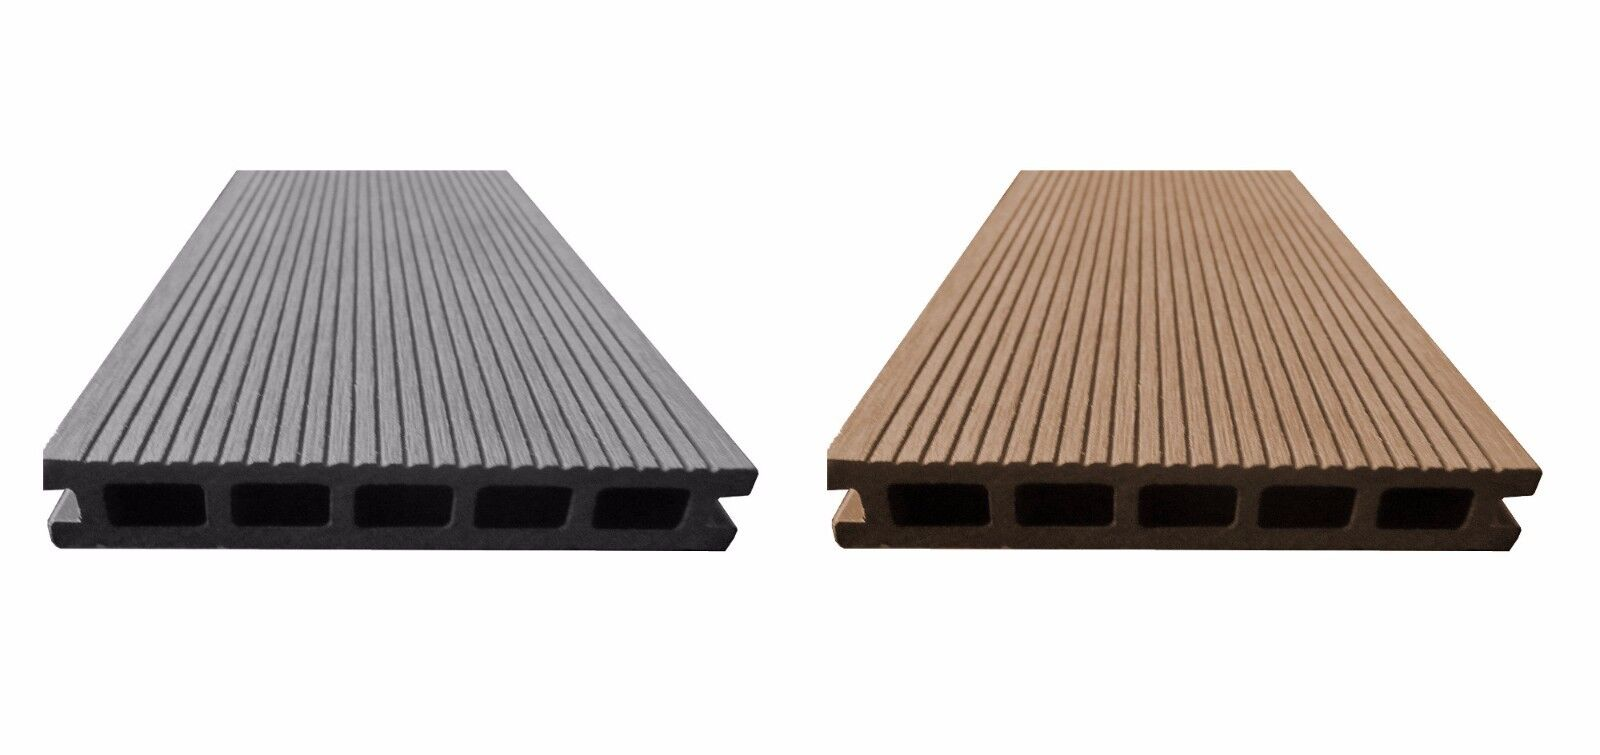 BPC Komplettset Terrassendielen Anthrazit O. Braun Komplettbausatz Holz WPC